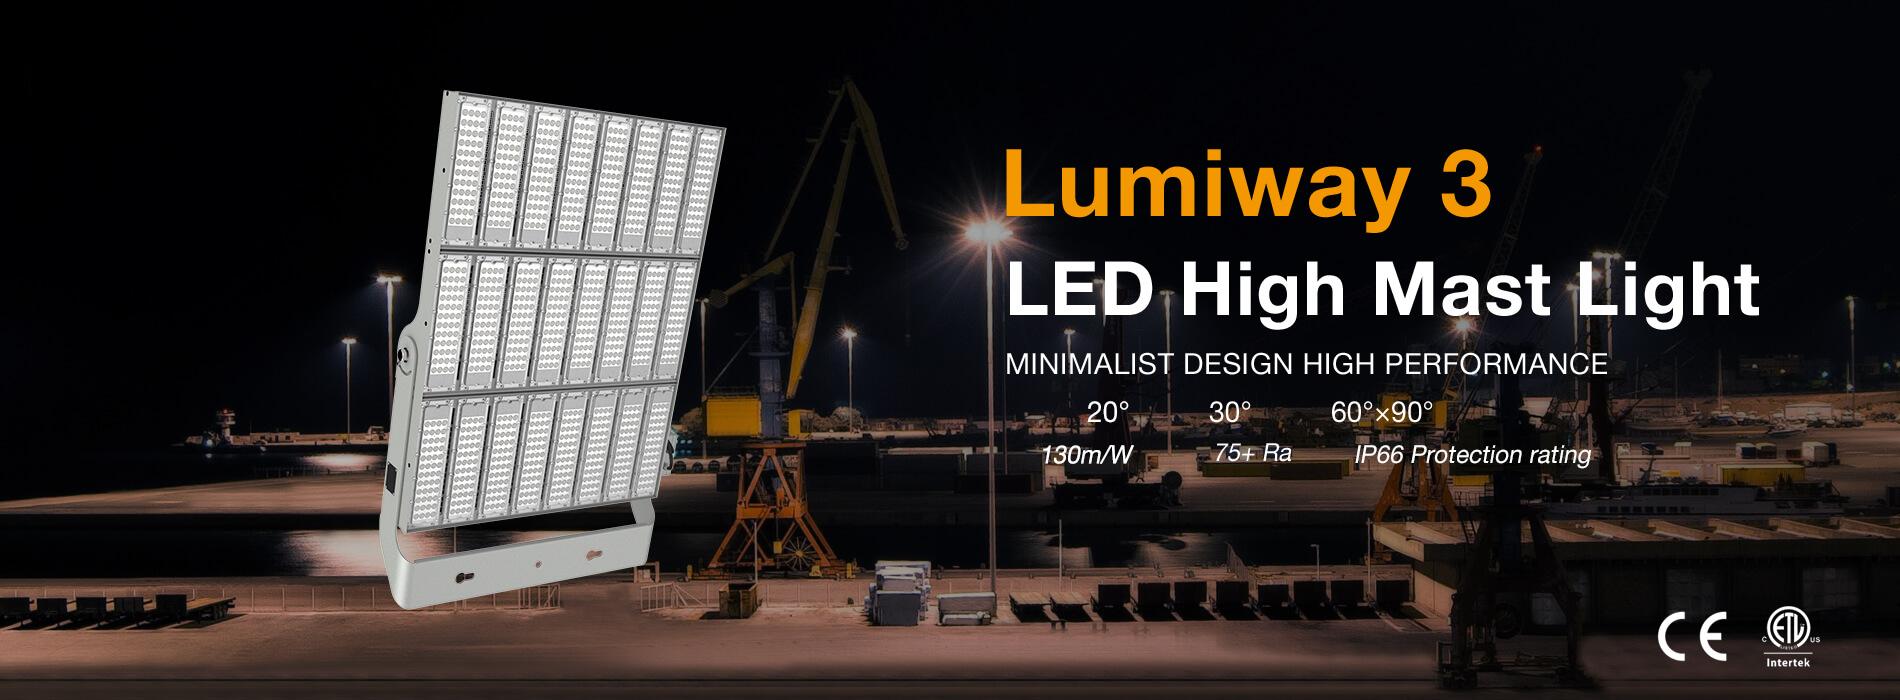 Lumiway 3 LED high mast light